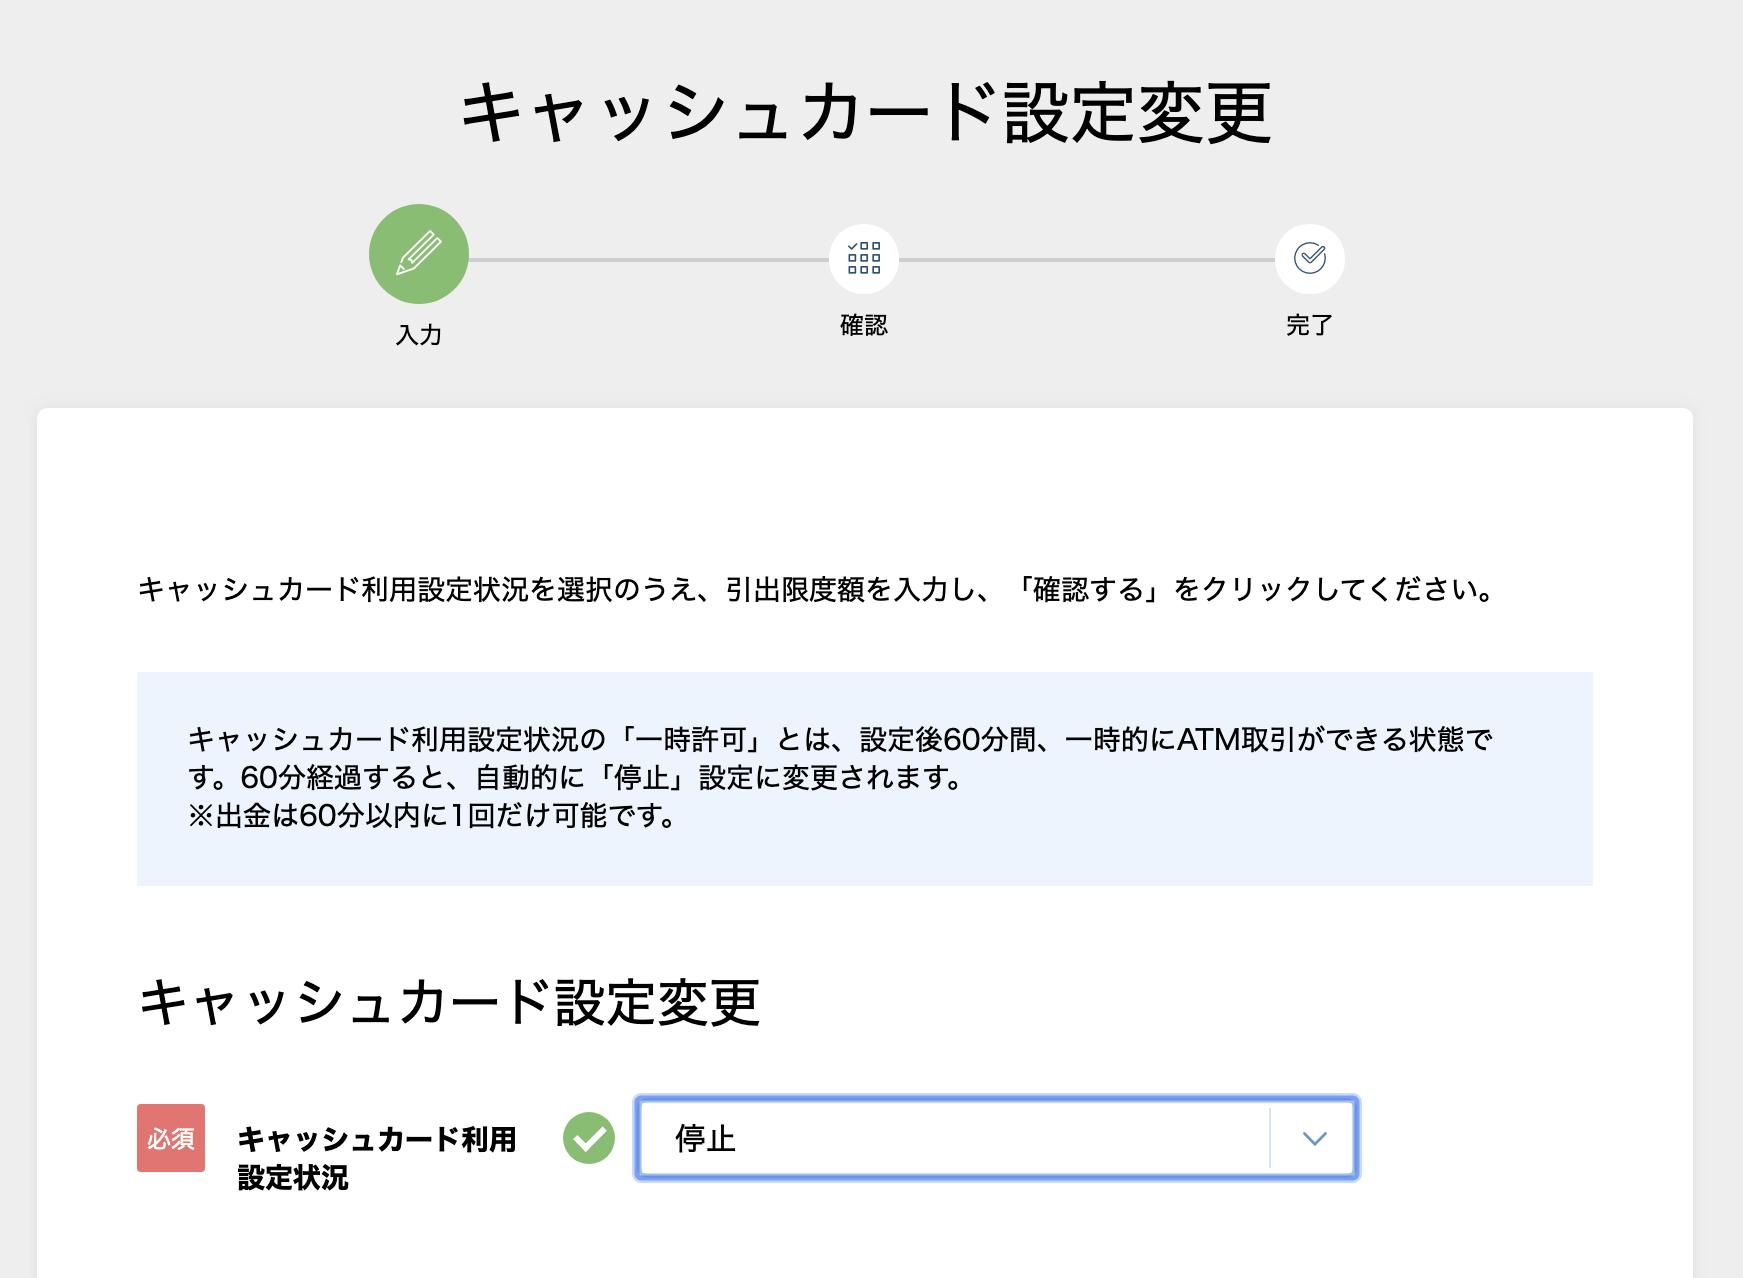 f:id:atsuhiro-me:20200603150425p:plain